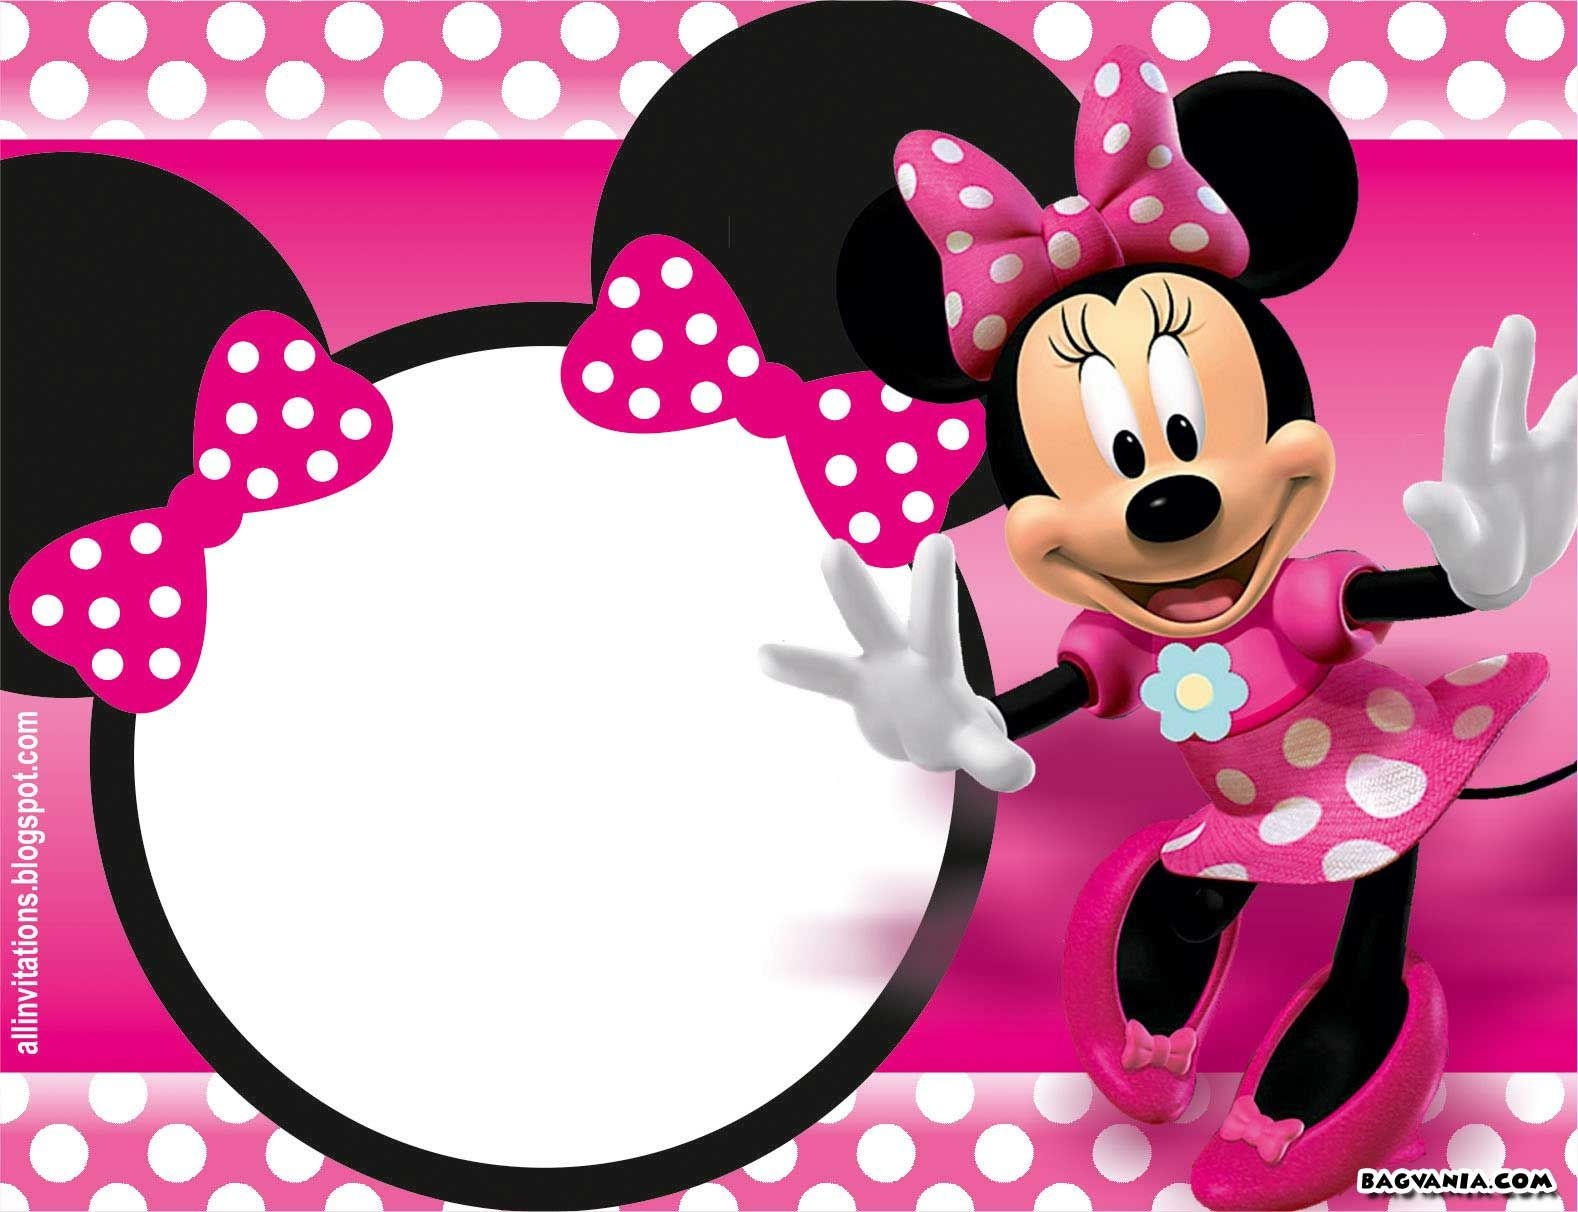 Free Printable Minnie Mouse Birthday Invitations – Bagvania Free - Free Printable Minnie Mouse Party Invitations